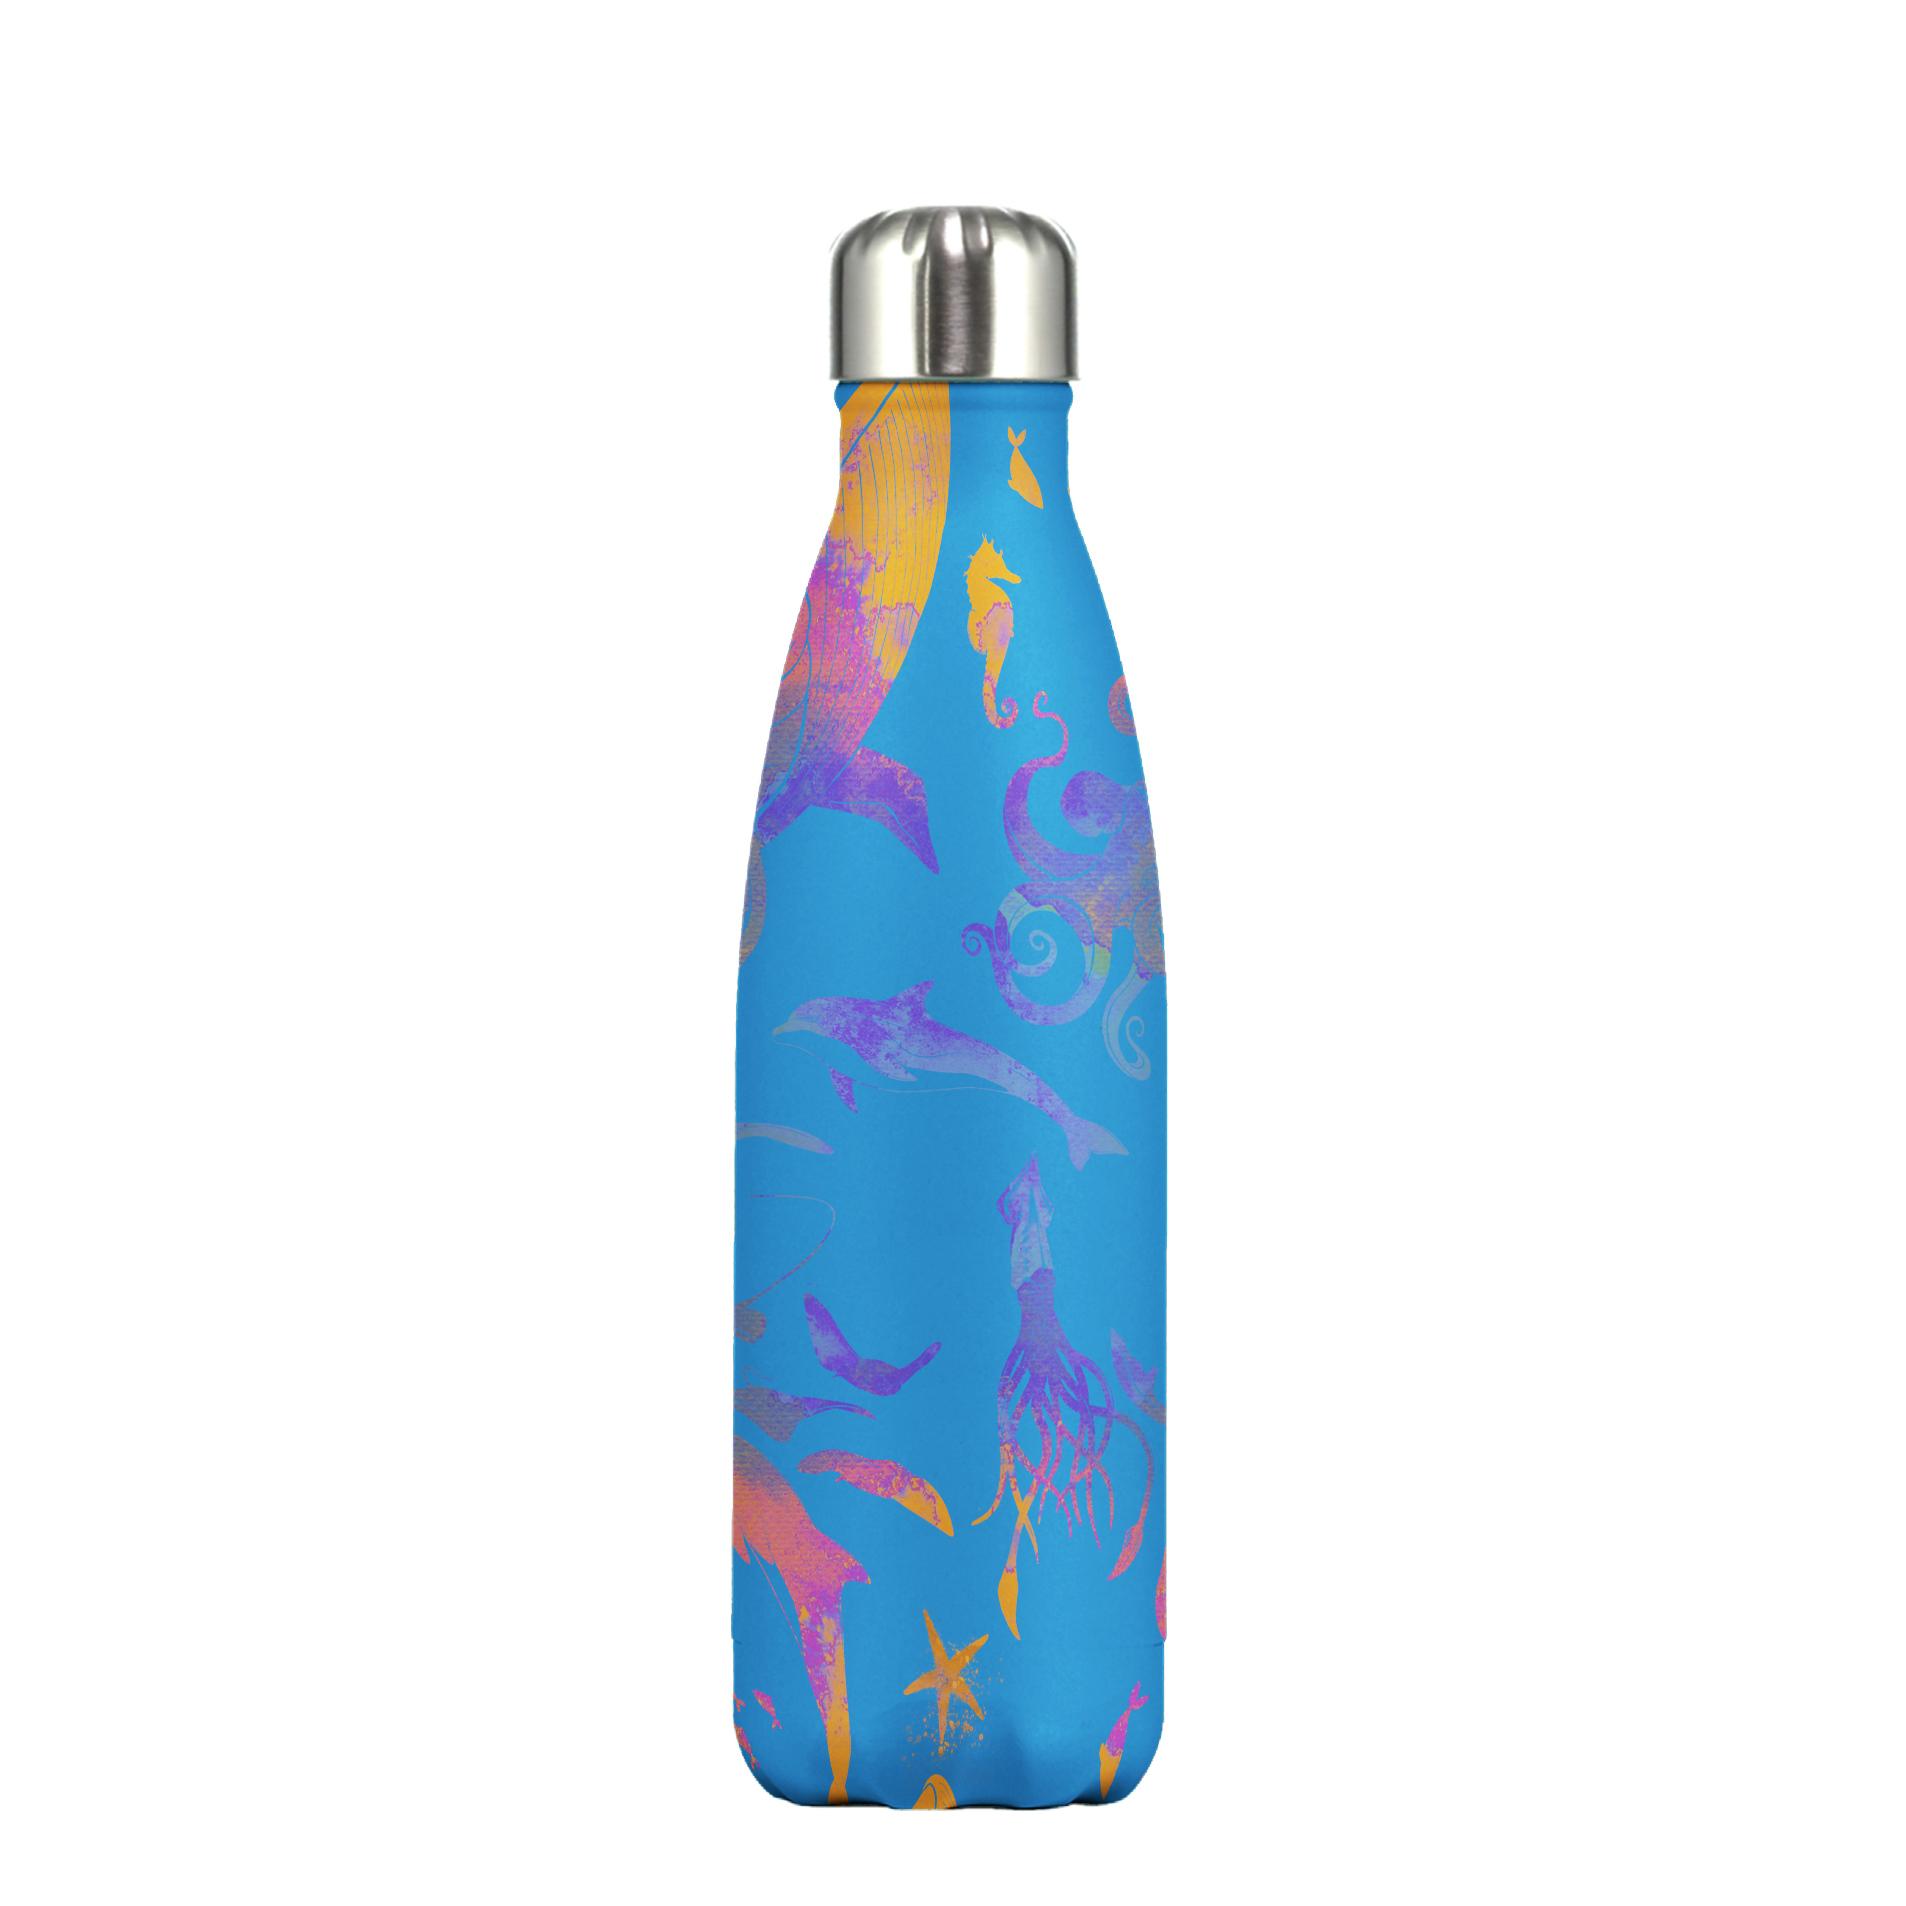 The Waters Bottle